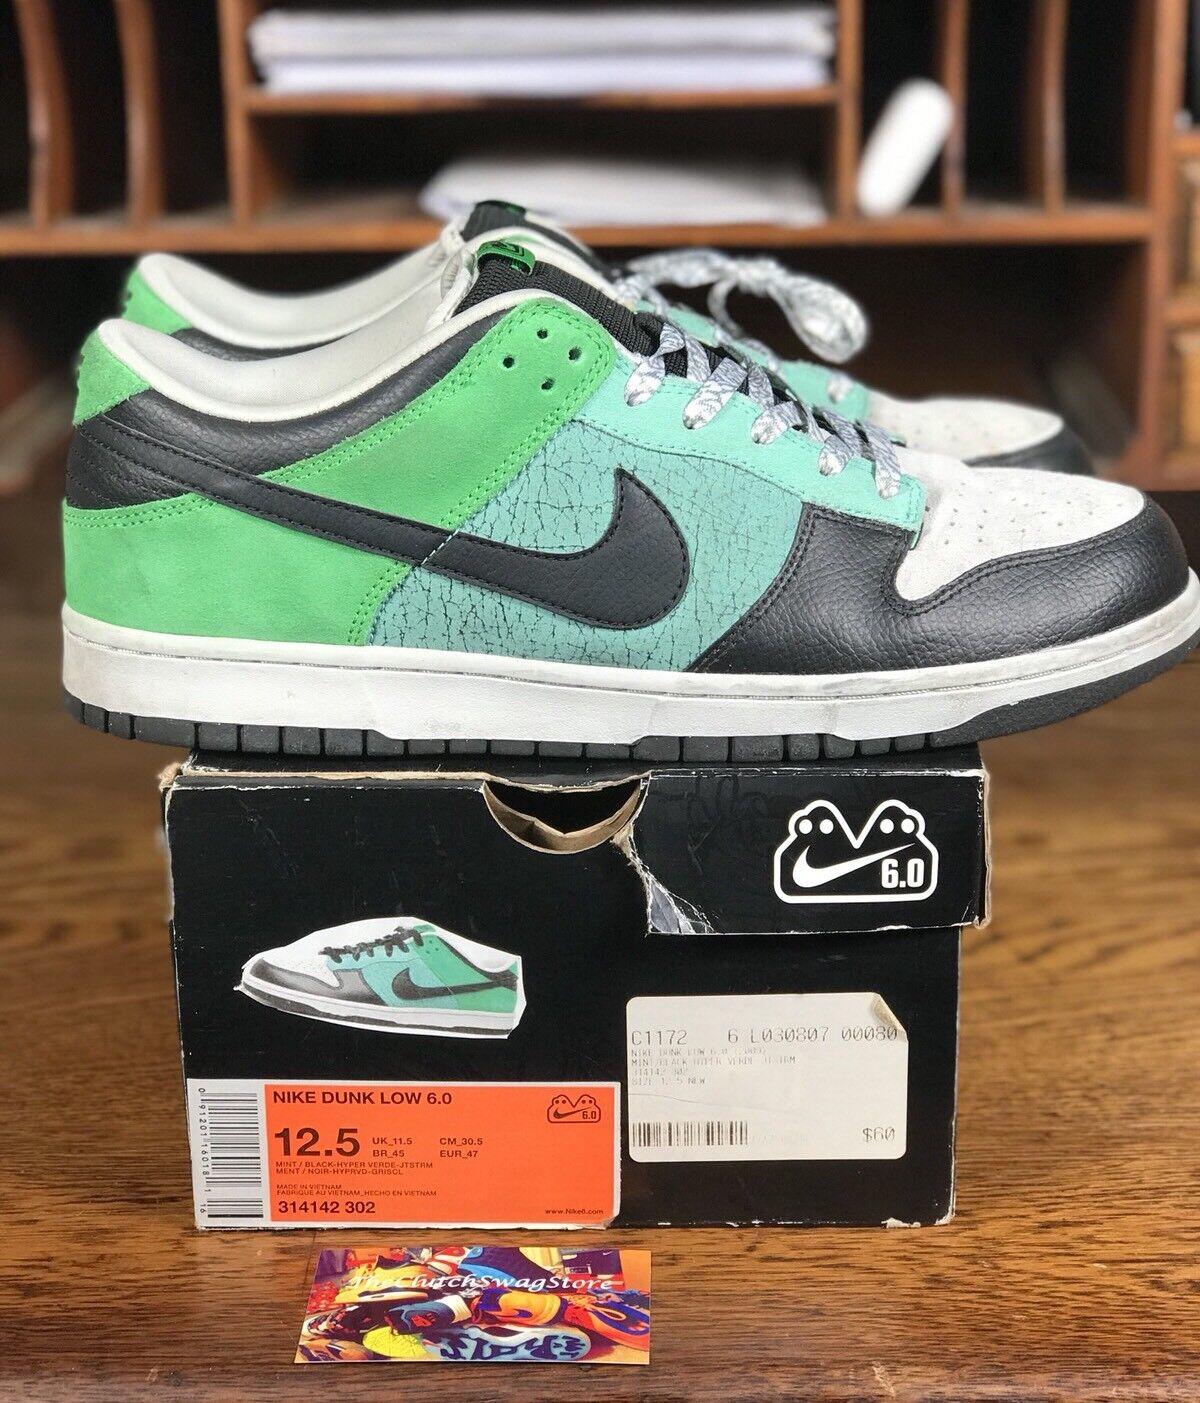 Nike e basso 6,0 mint jetstream / nero / verde jetstream mint (314142-302) Uomo sb misura 12,5 cd65d9